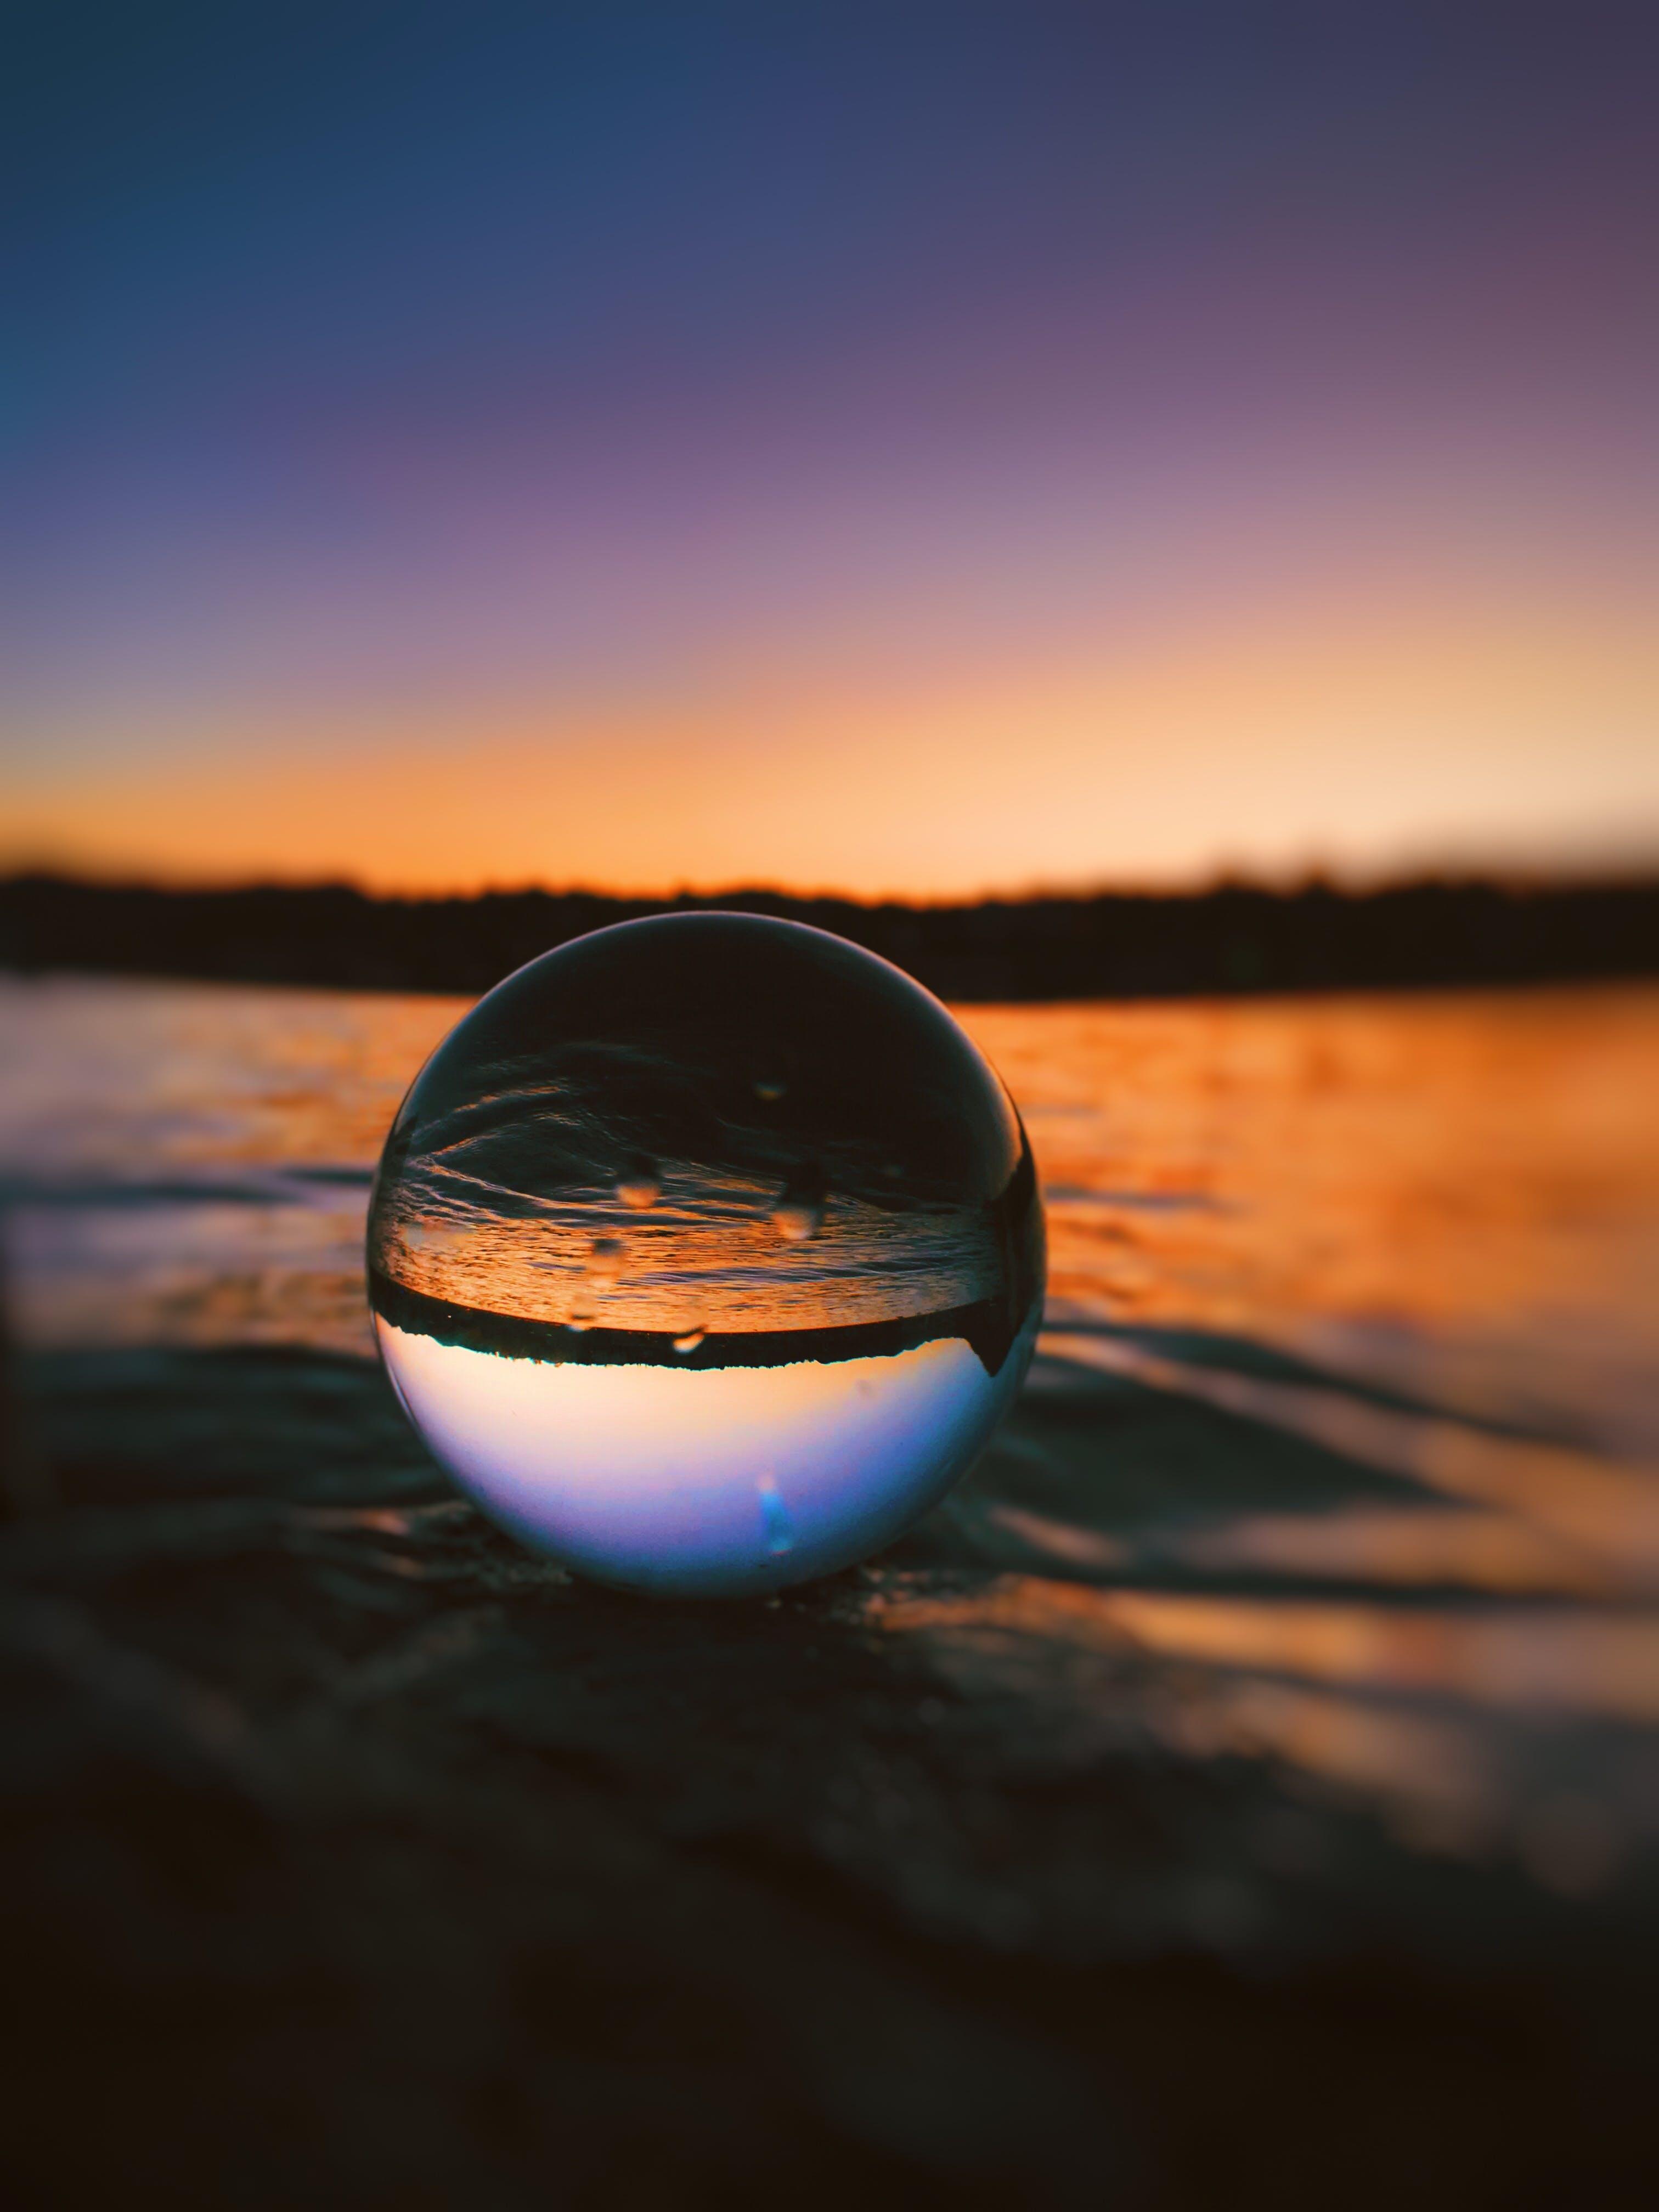 H2O, 反射, 地平線, 天性 的 免費圖庫相片